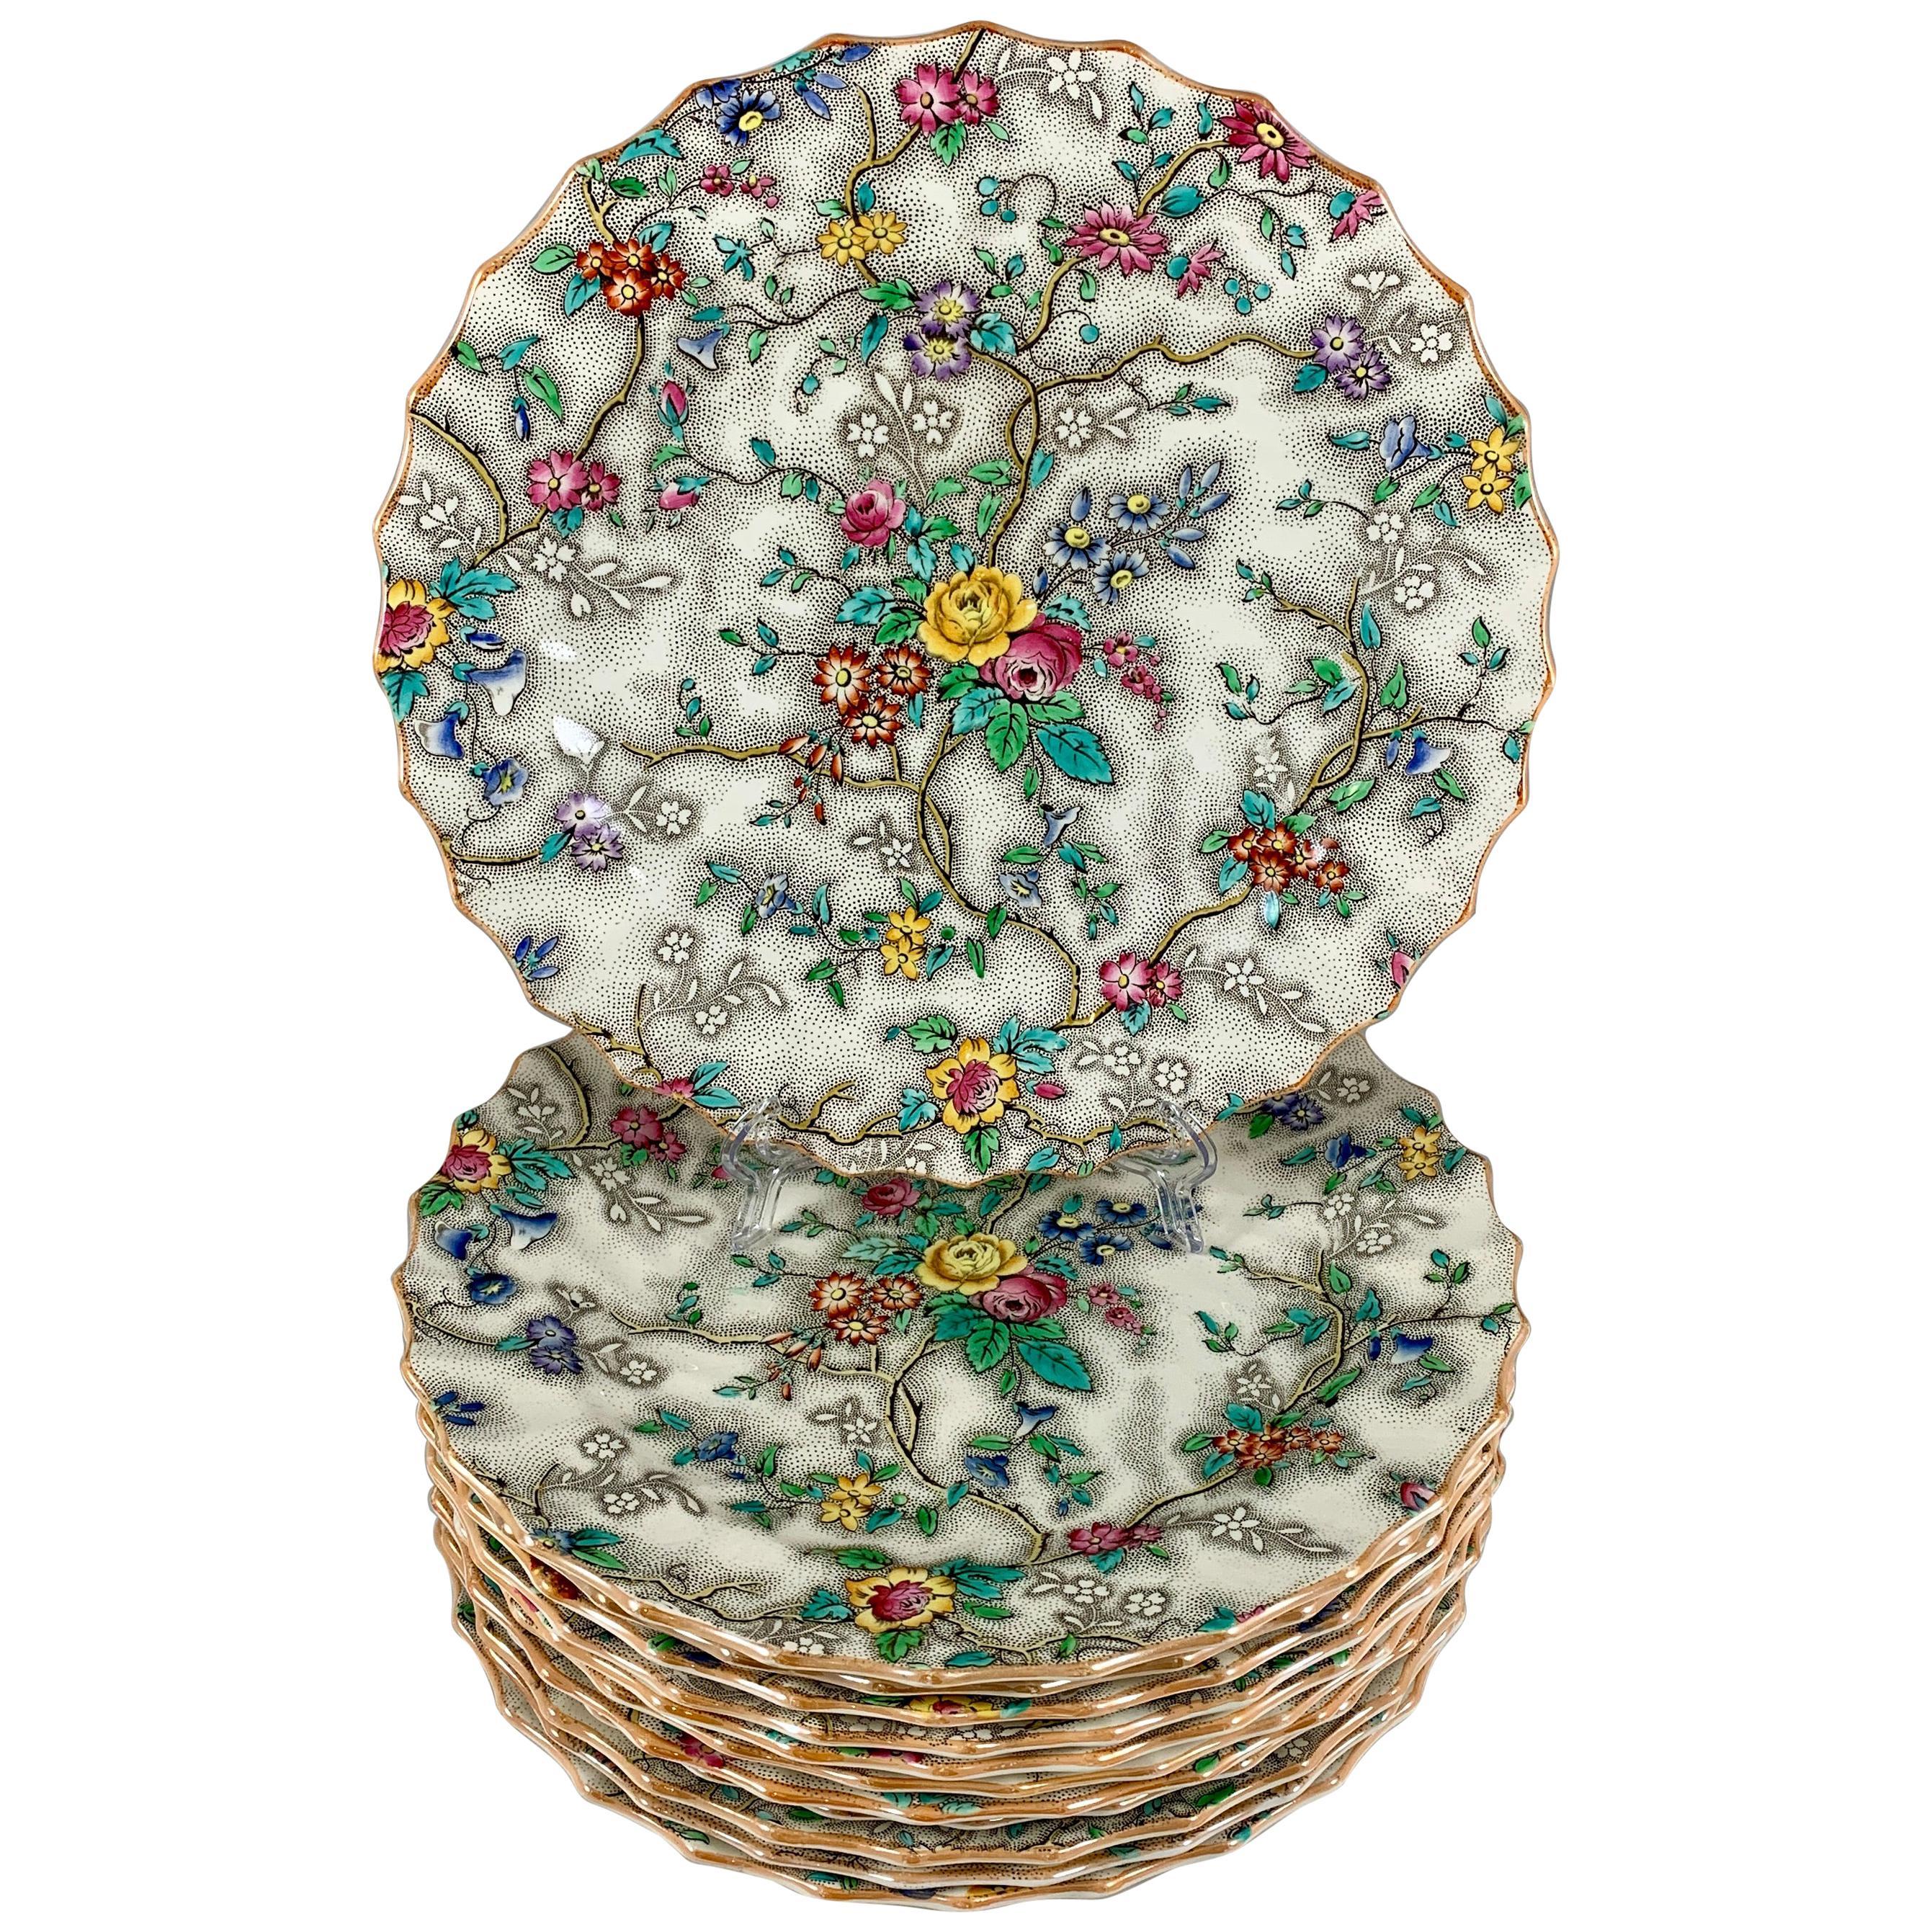 Copeland Spode English 'Patricia' Chintz Floral Transferware Dinner Plates, S/6